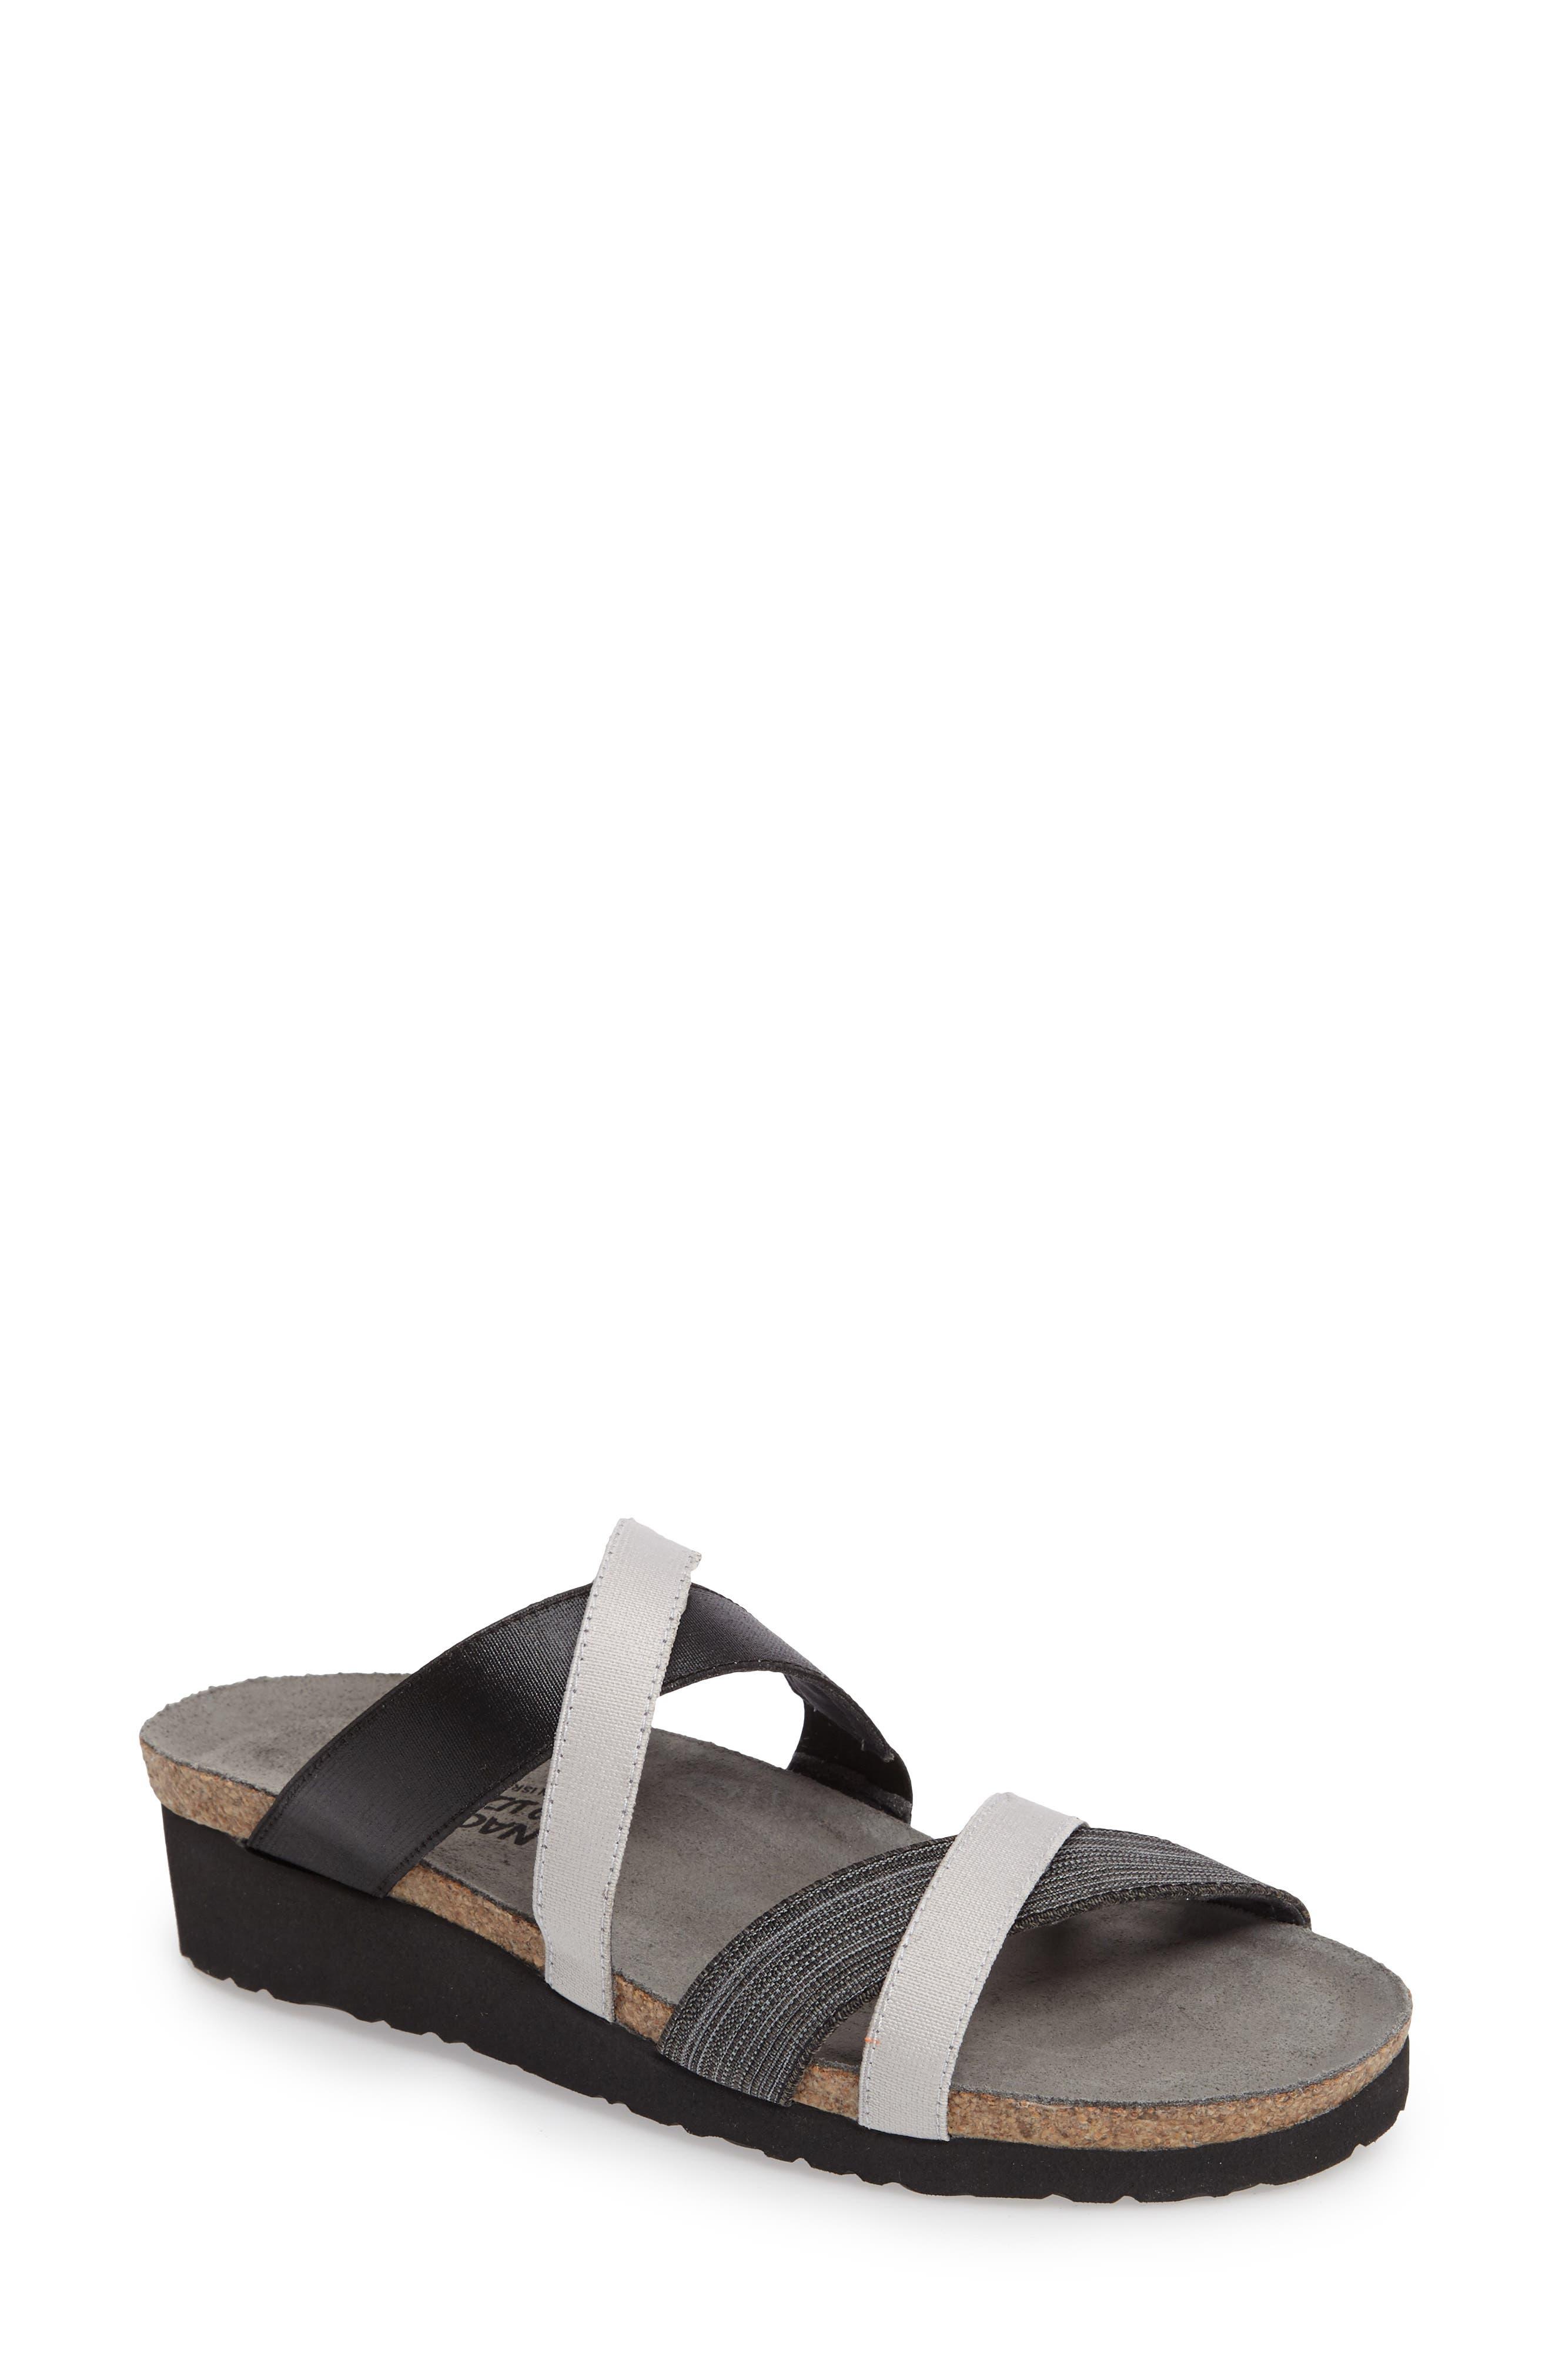 NAOT, Roxana Strappy Slip-On Sandal, Main thumbnail 1, color, BLACK/ GREY FABRIC